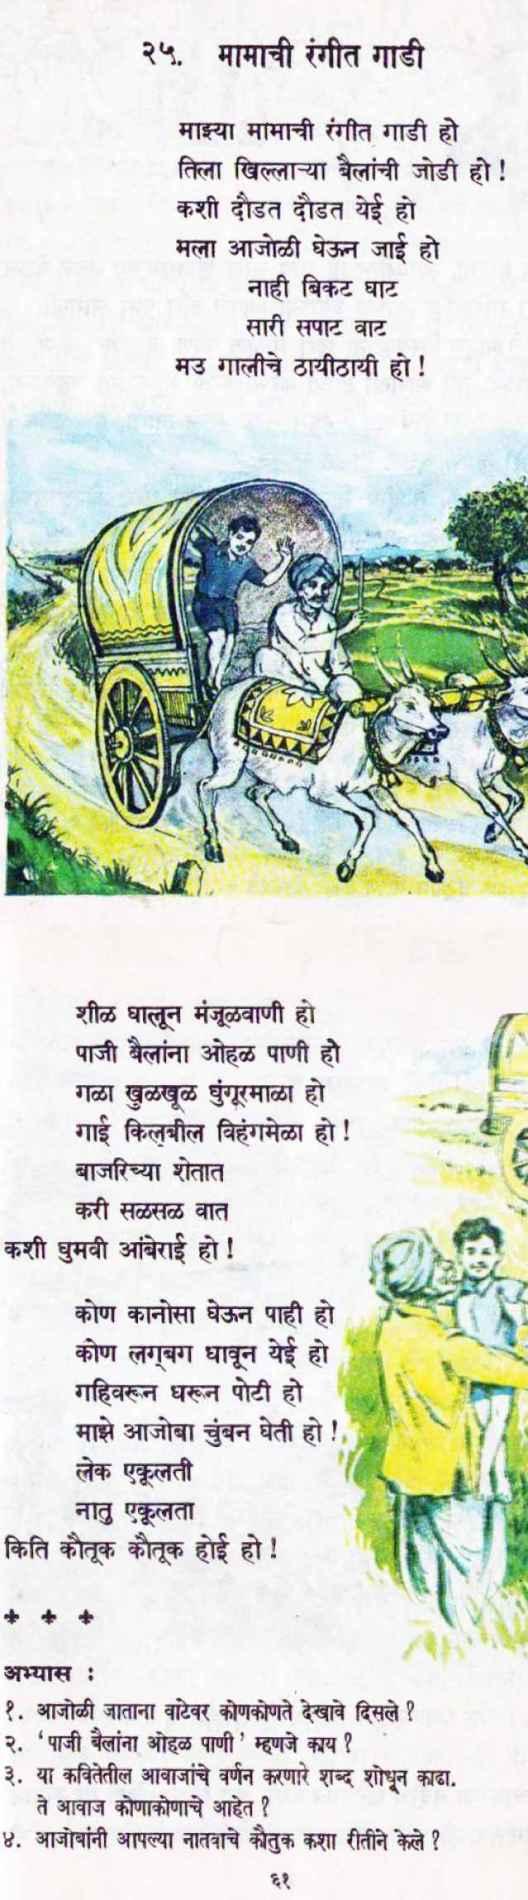 Balbharati Poem Songs - Mazhya Mamachi Rangit Gadi -माझ्या मामाची रंगीत गाडी हो